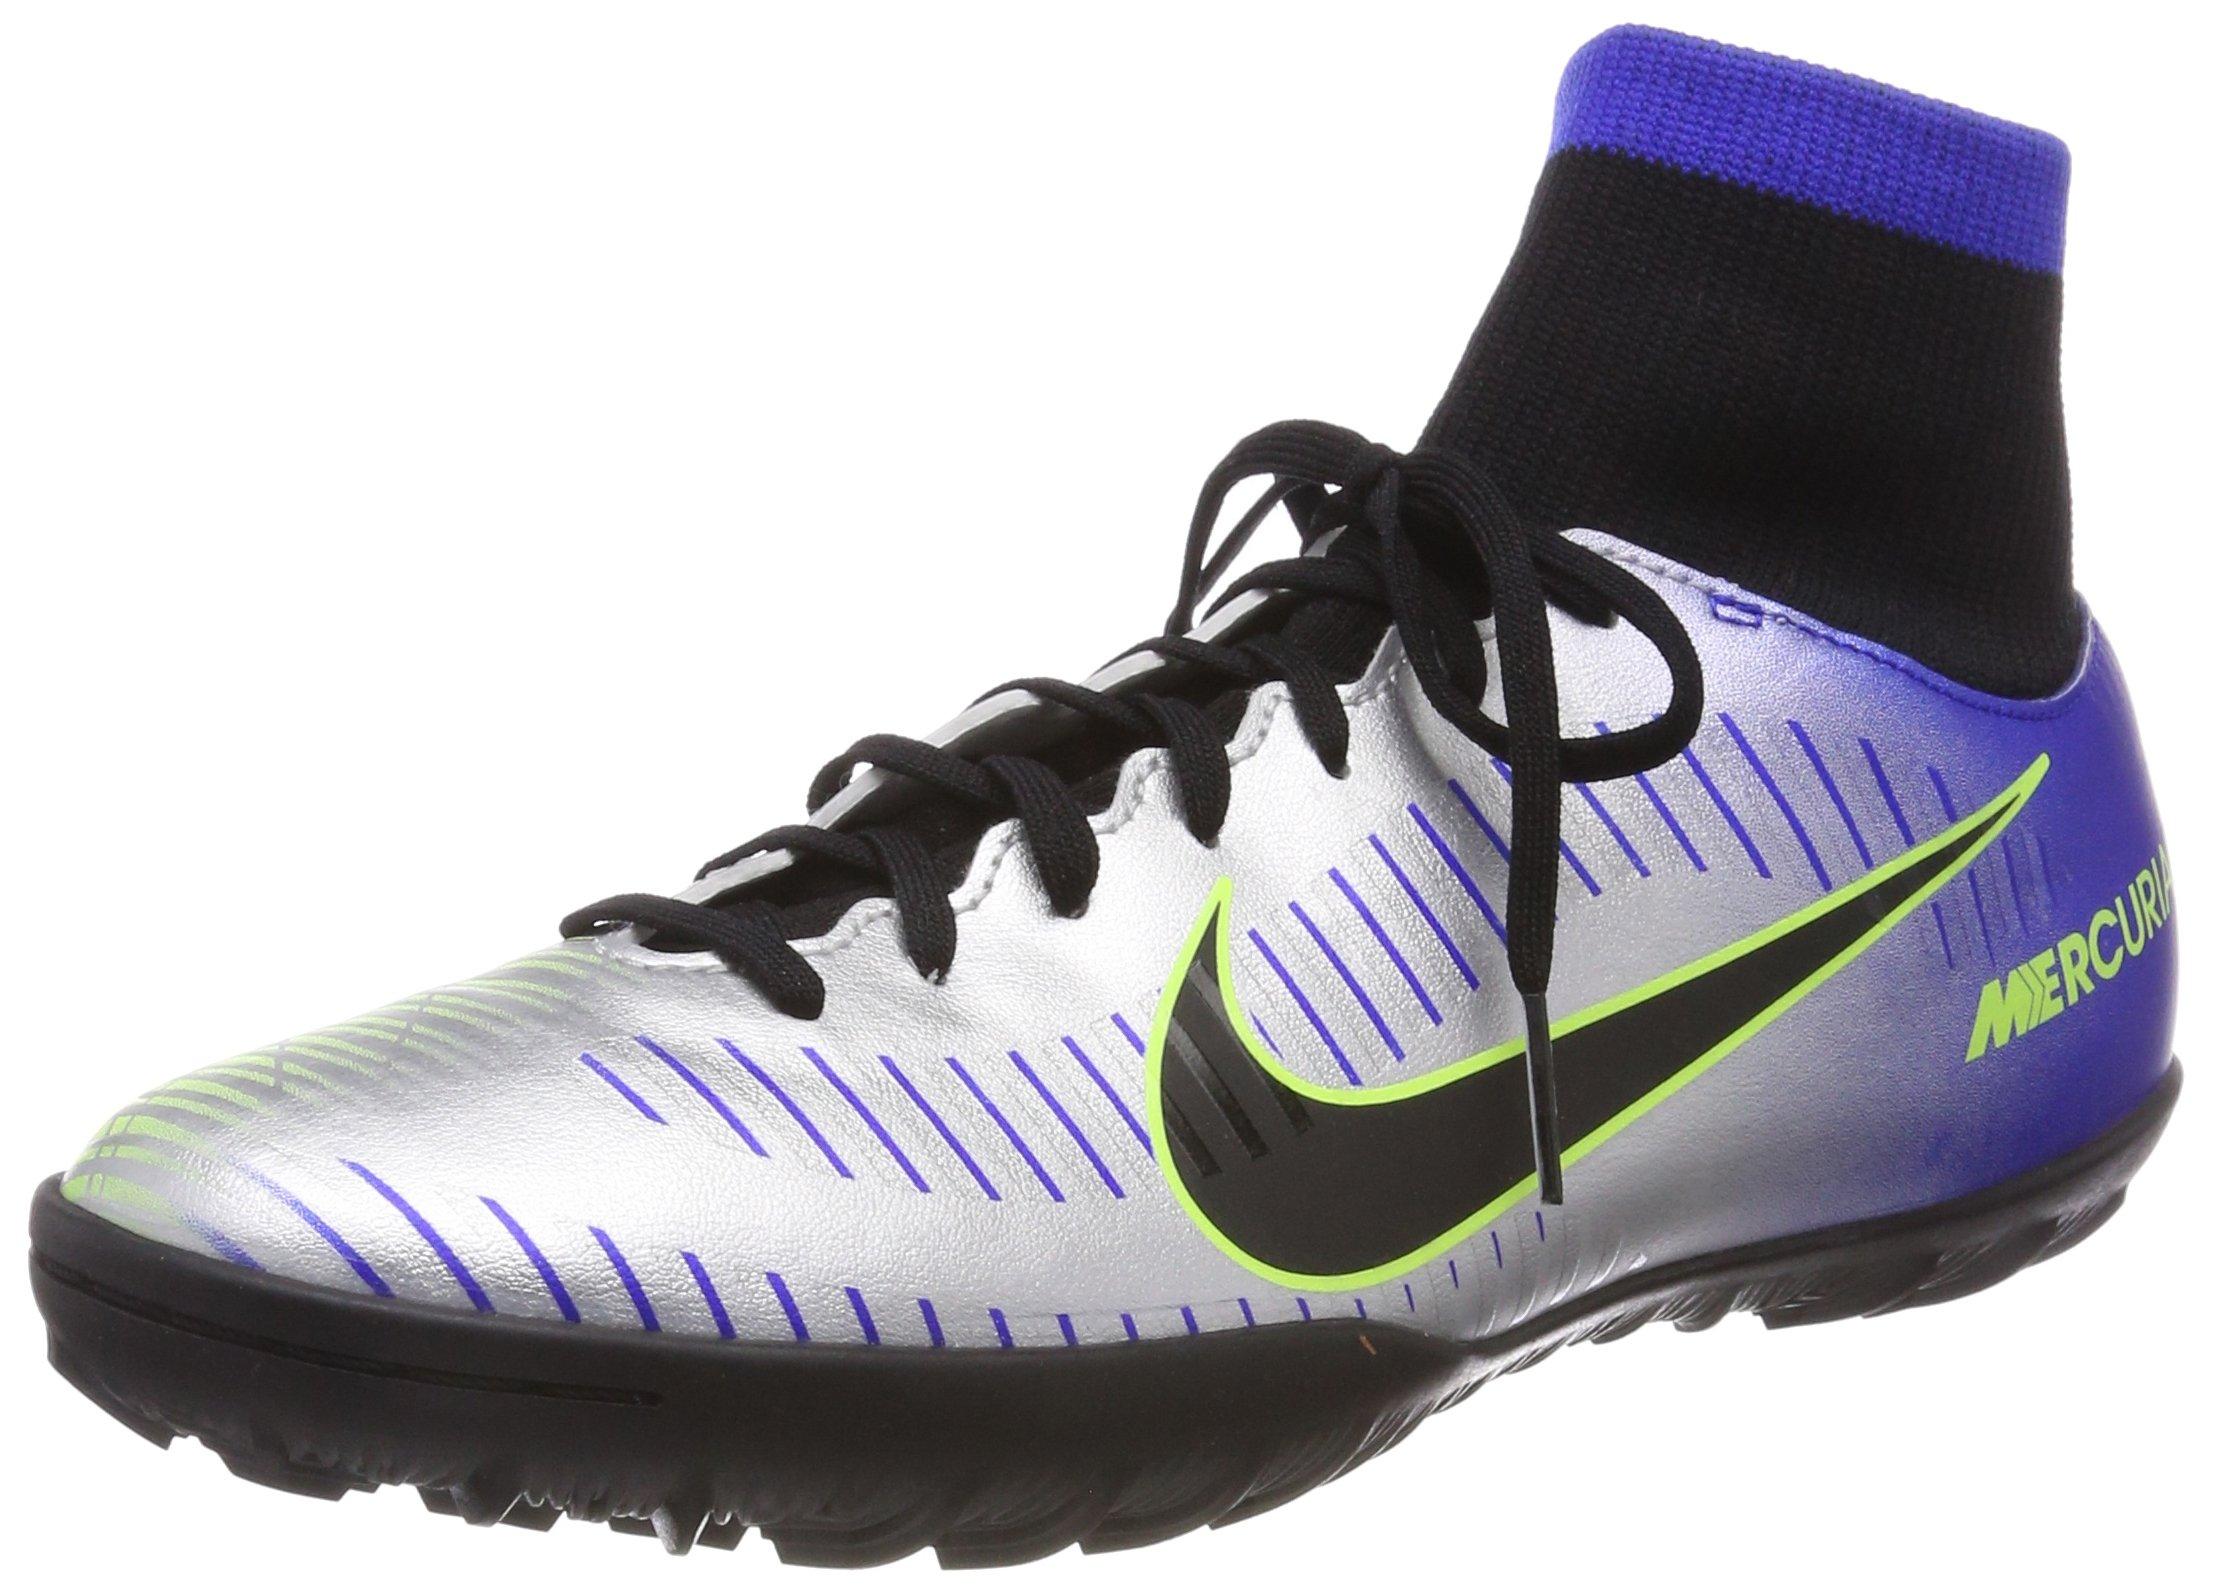 cheaper 64931 b8738 Nike Mercurialx Victory 6 DF NJR Tf, Scarpe Sportive Uomo